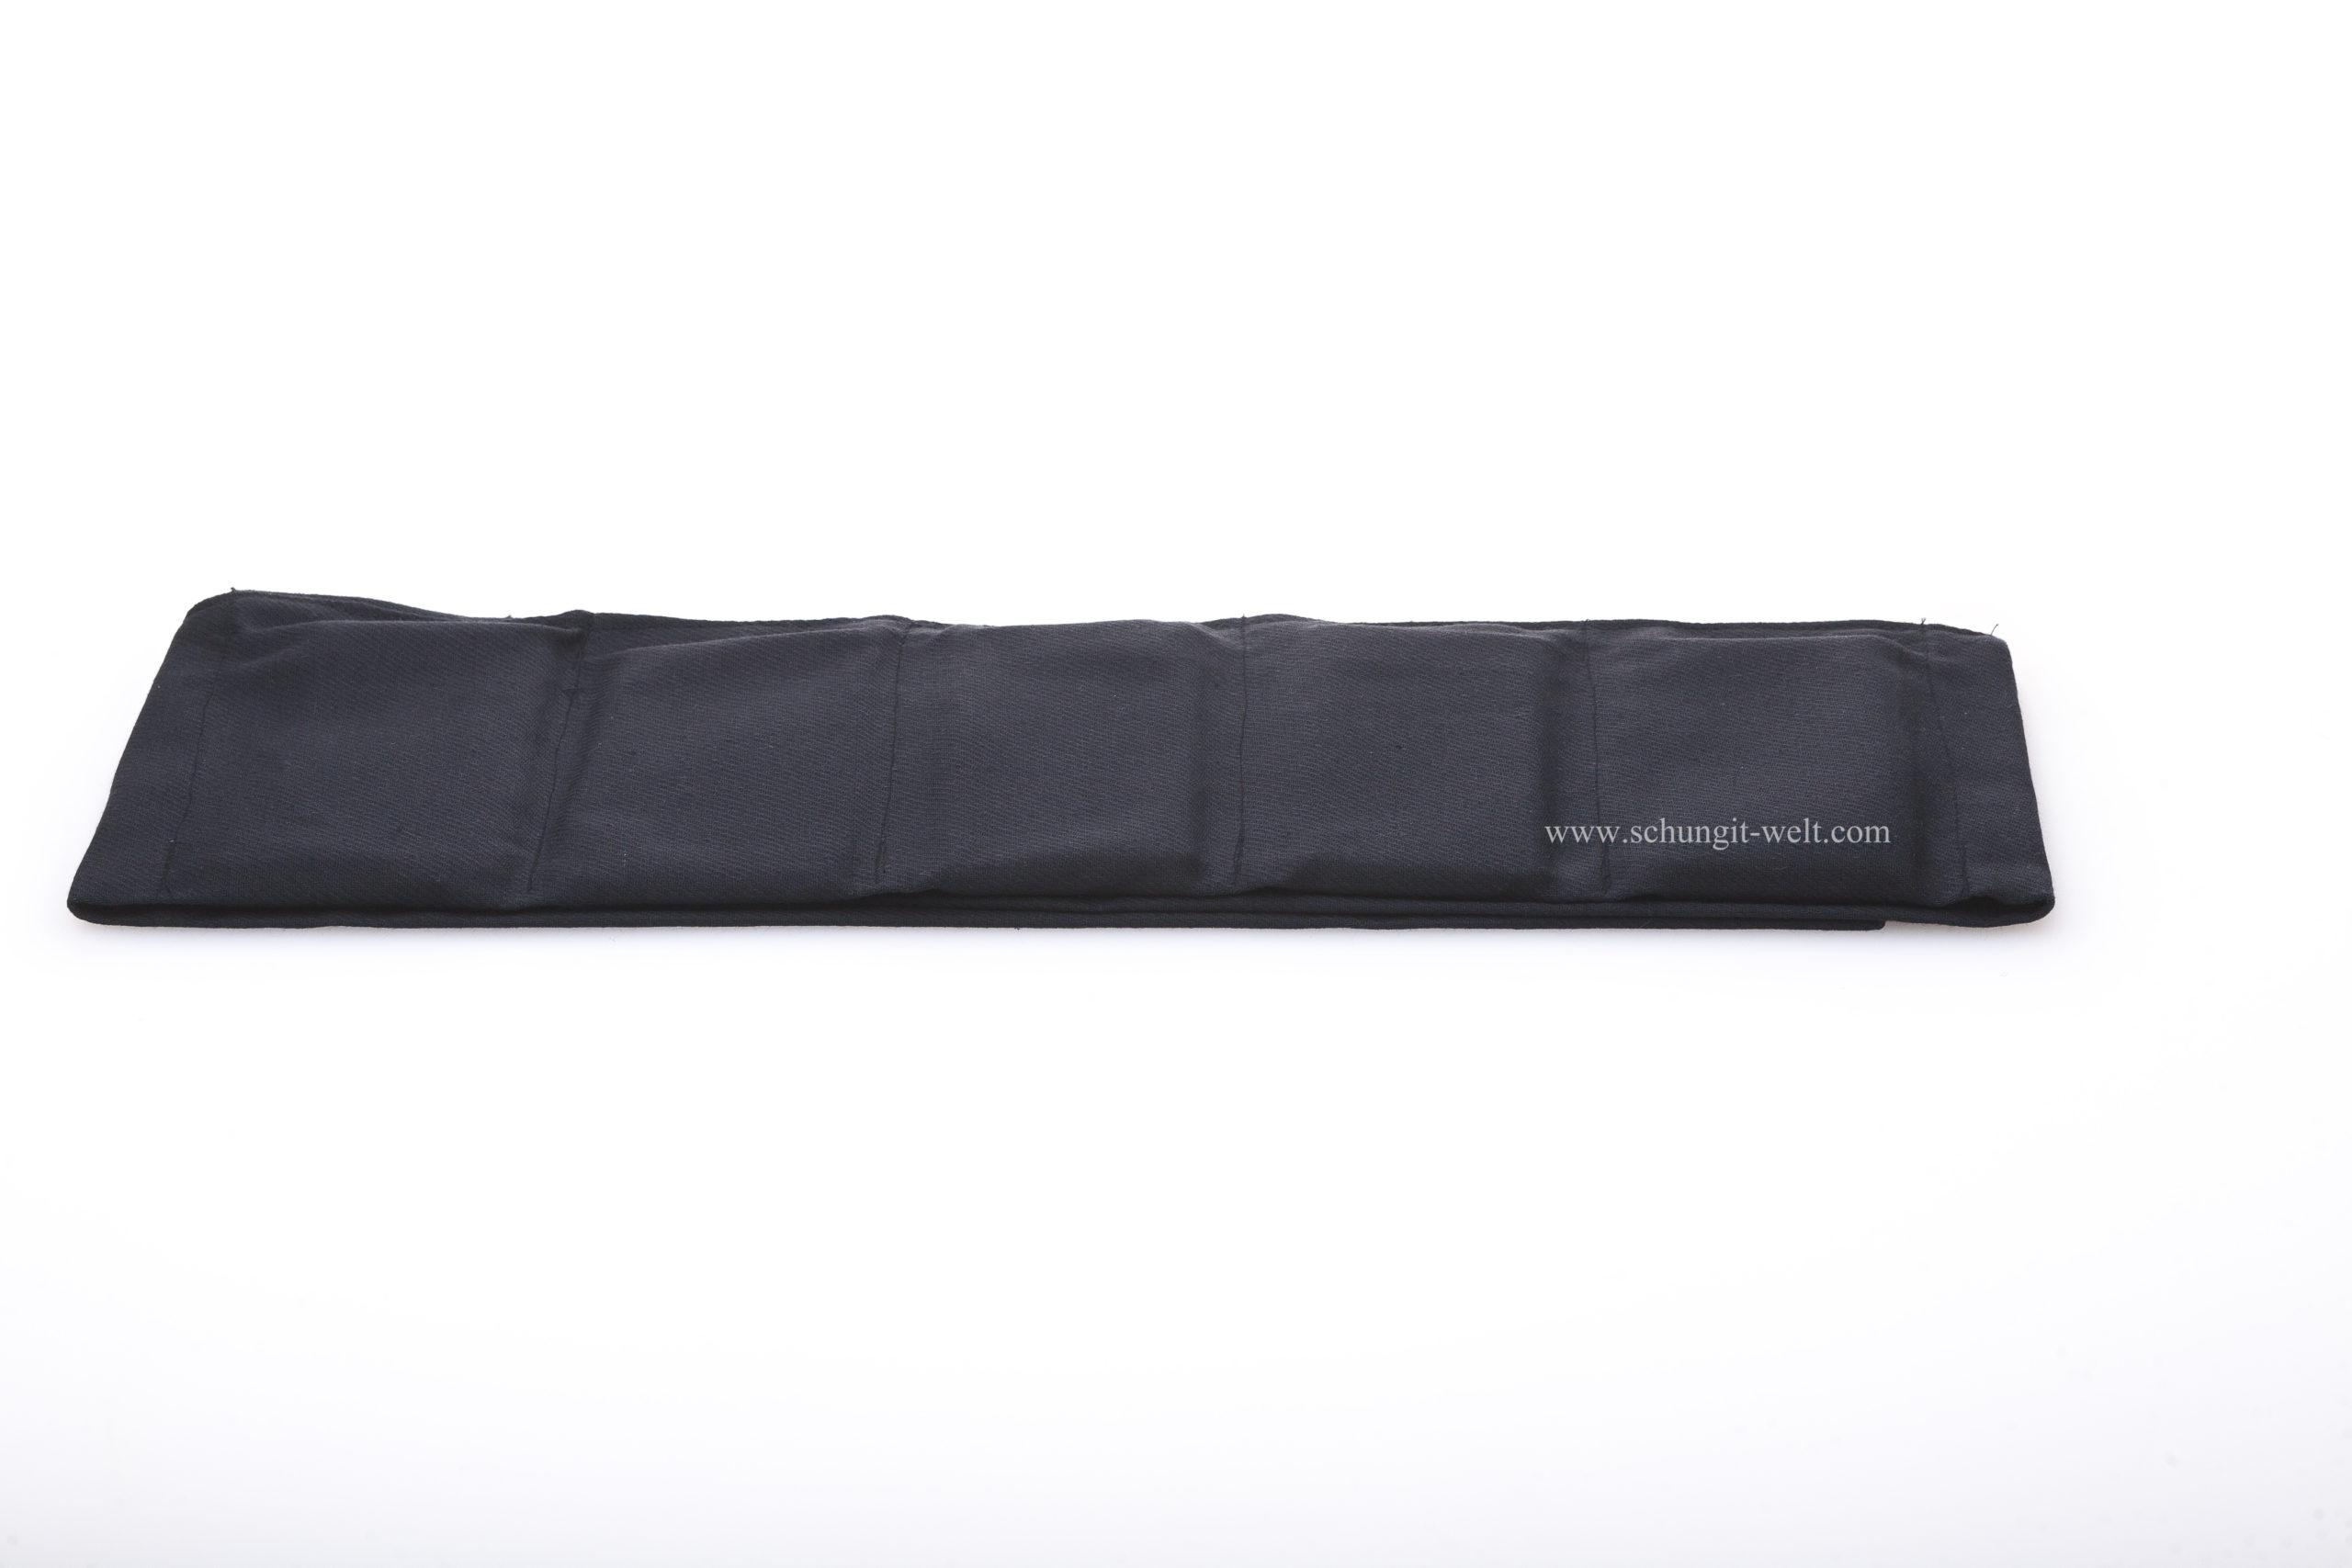 Gürtel mit Schungit-Platten -432